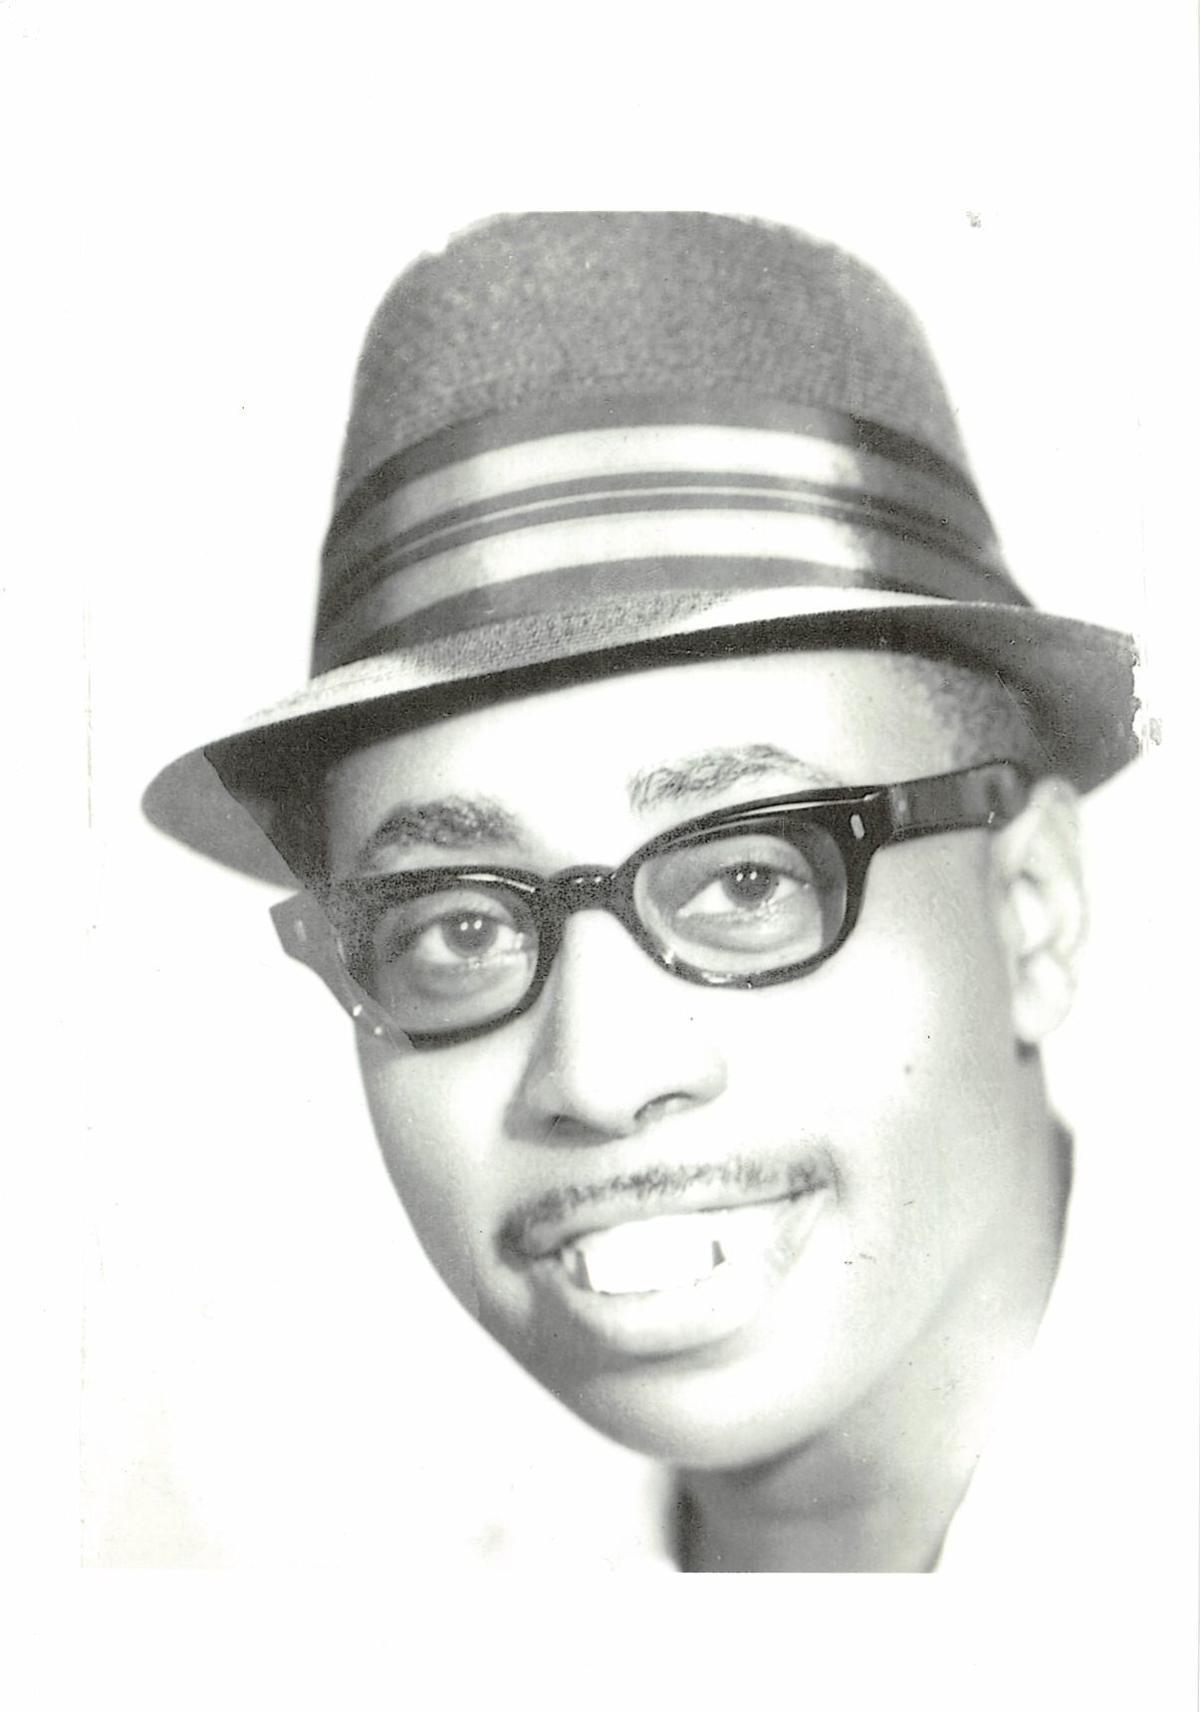 Arthur Moody